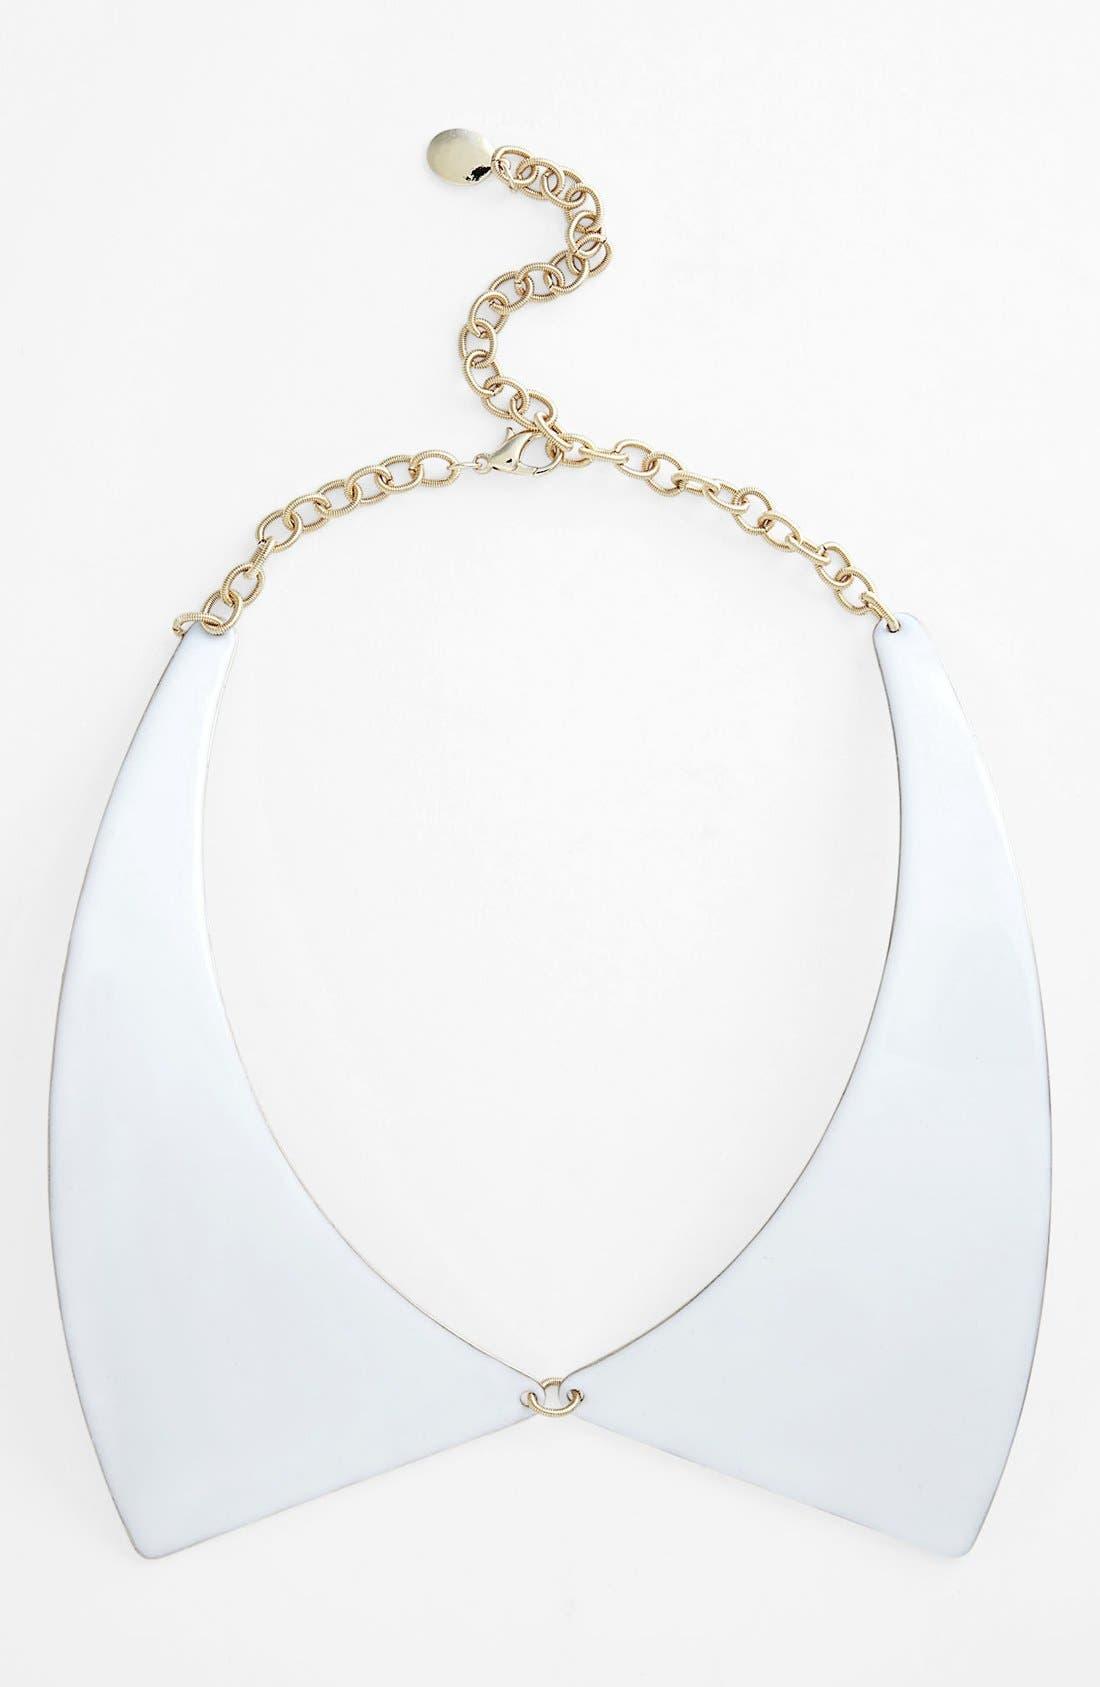 Main Image - Bonnie Jonas Metal Collar Necklace